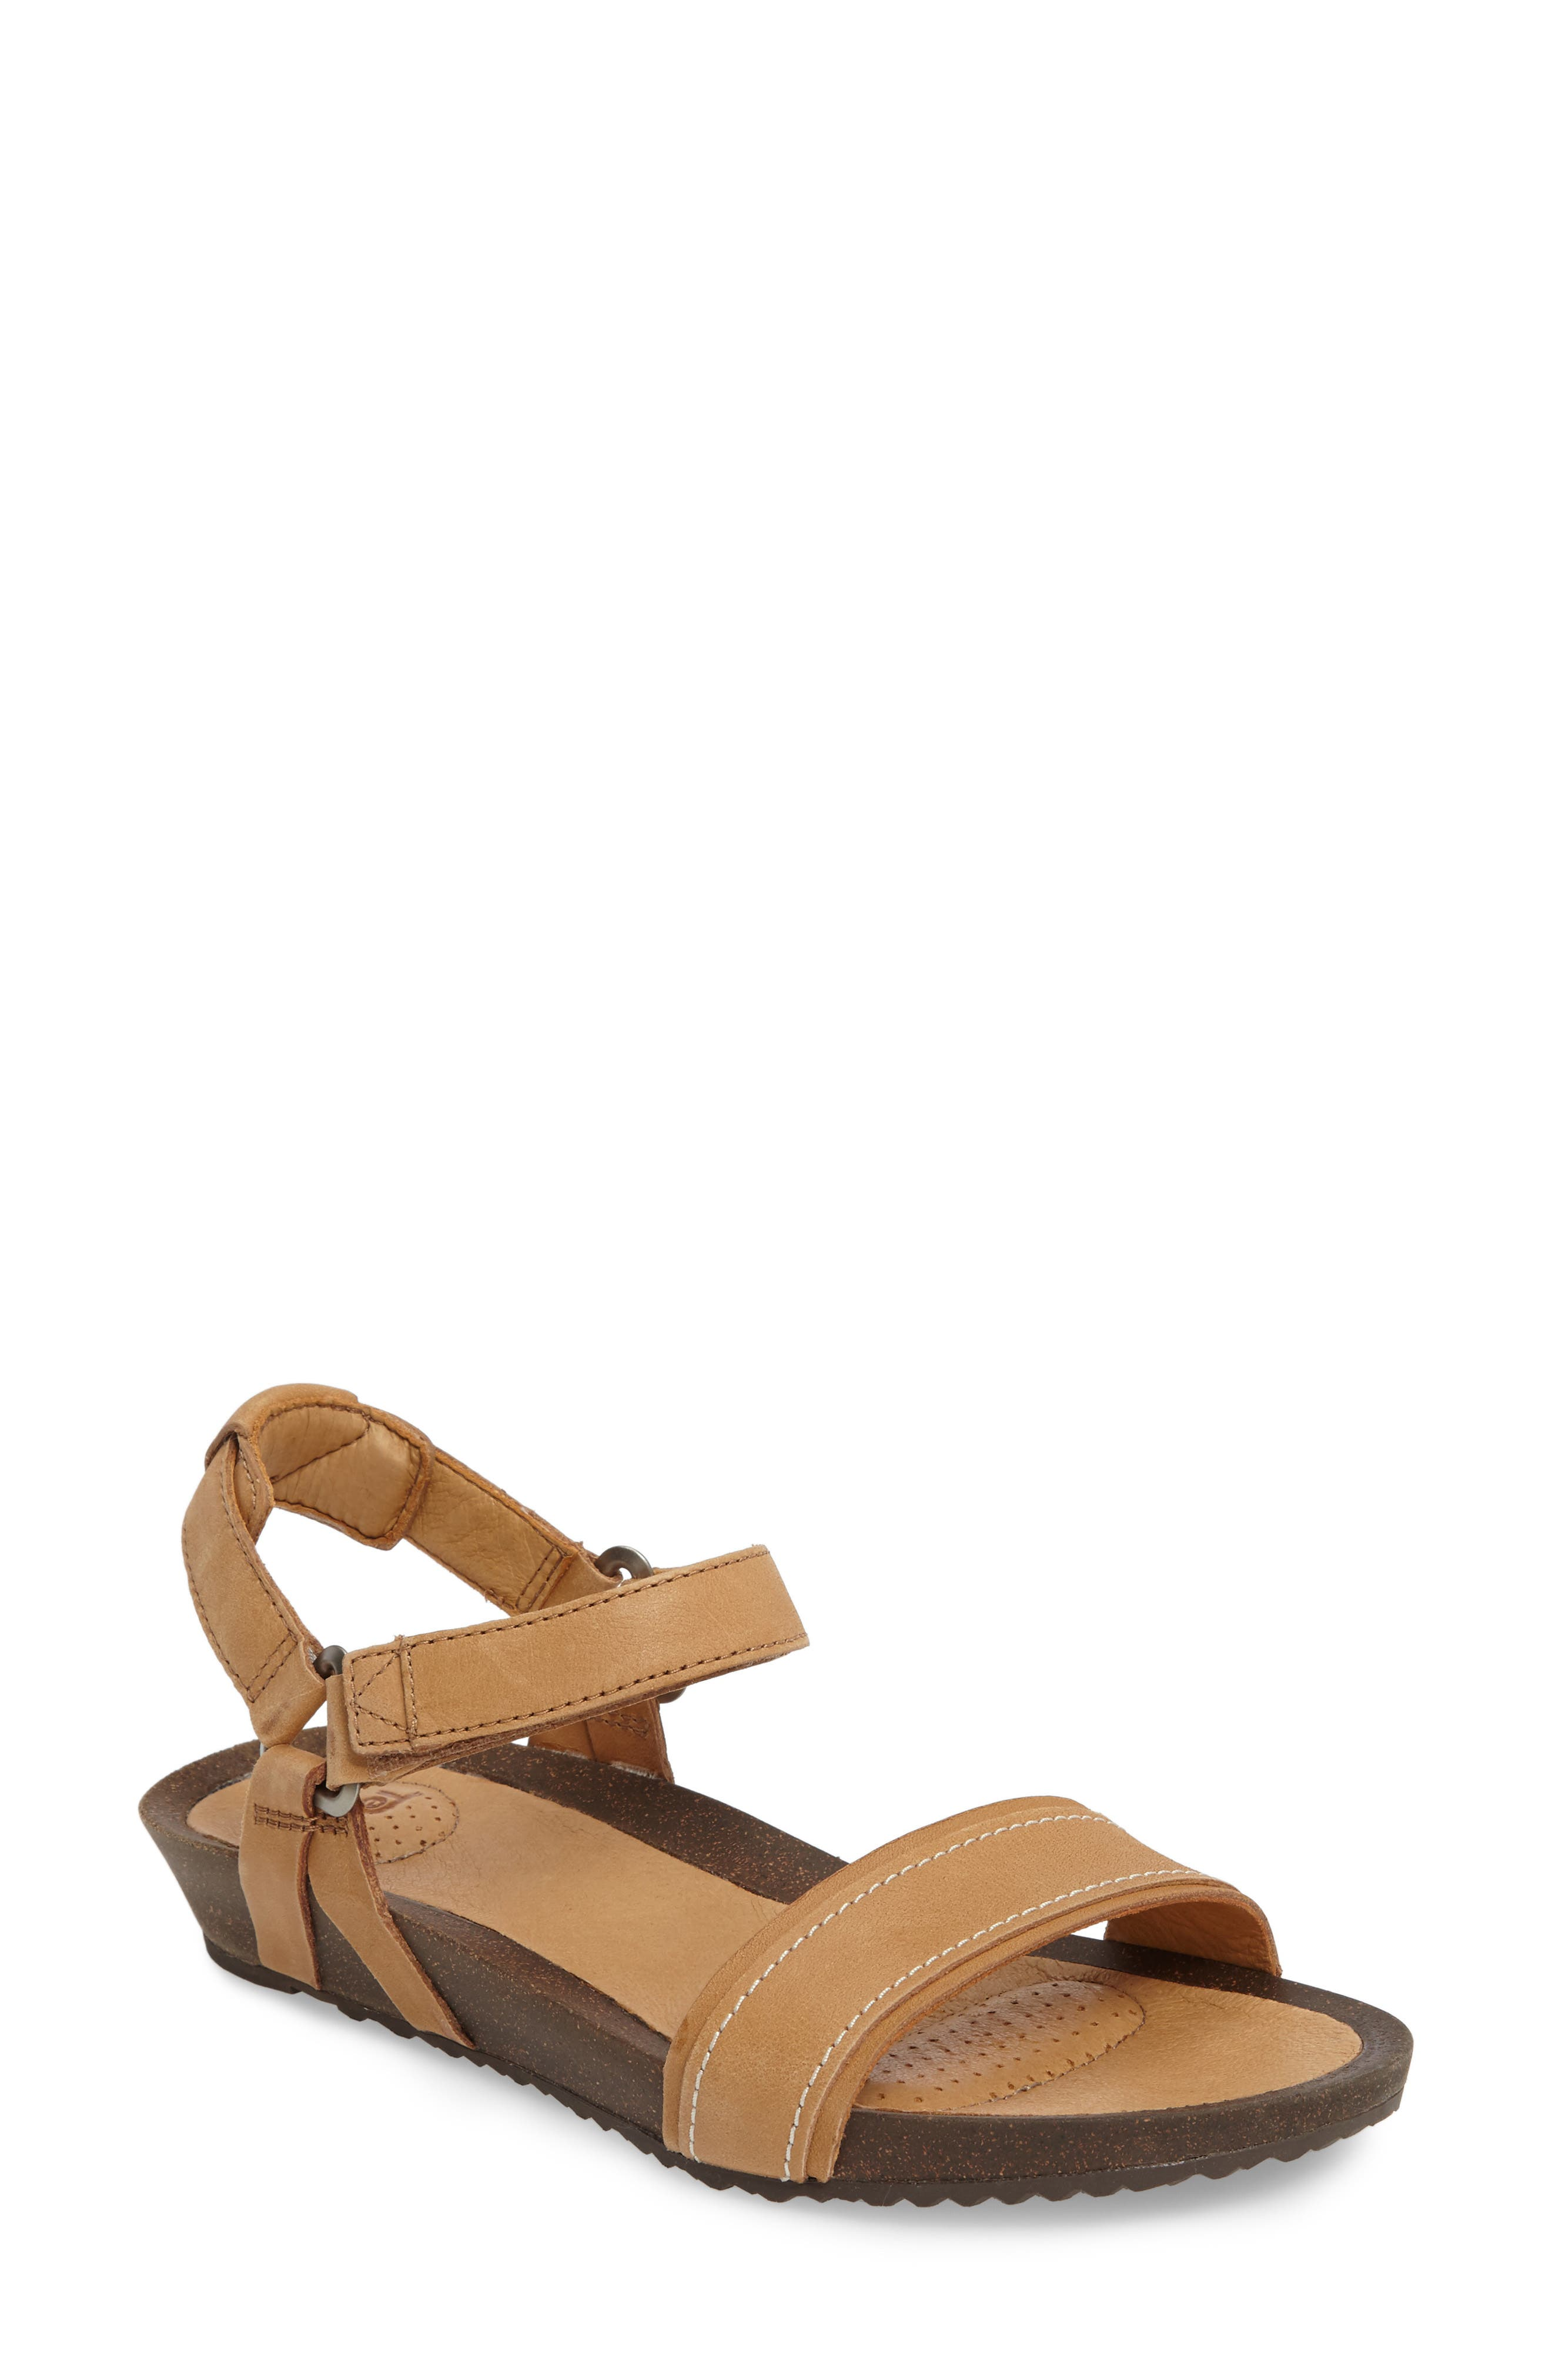 Teva Ysidro Stitch Sandal (Women)